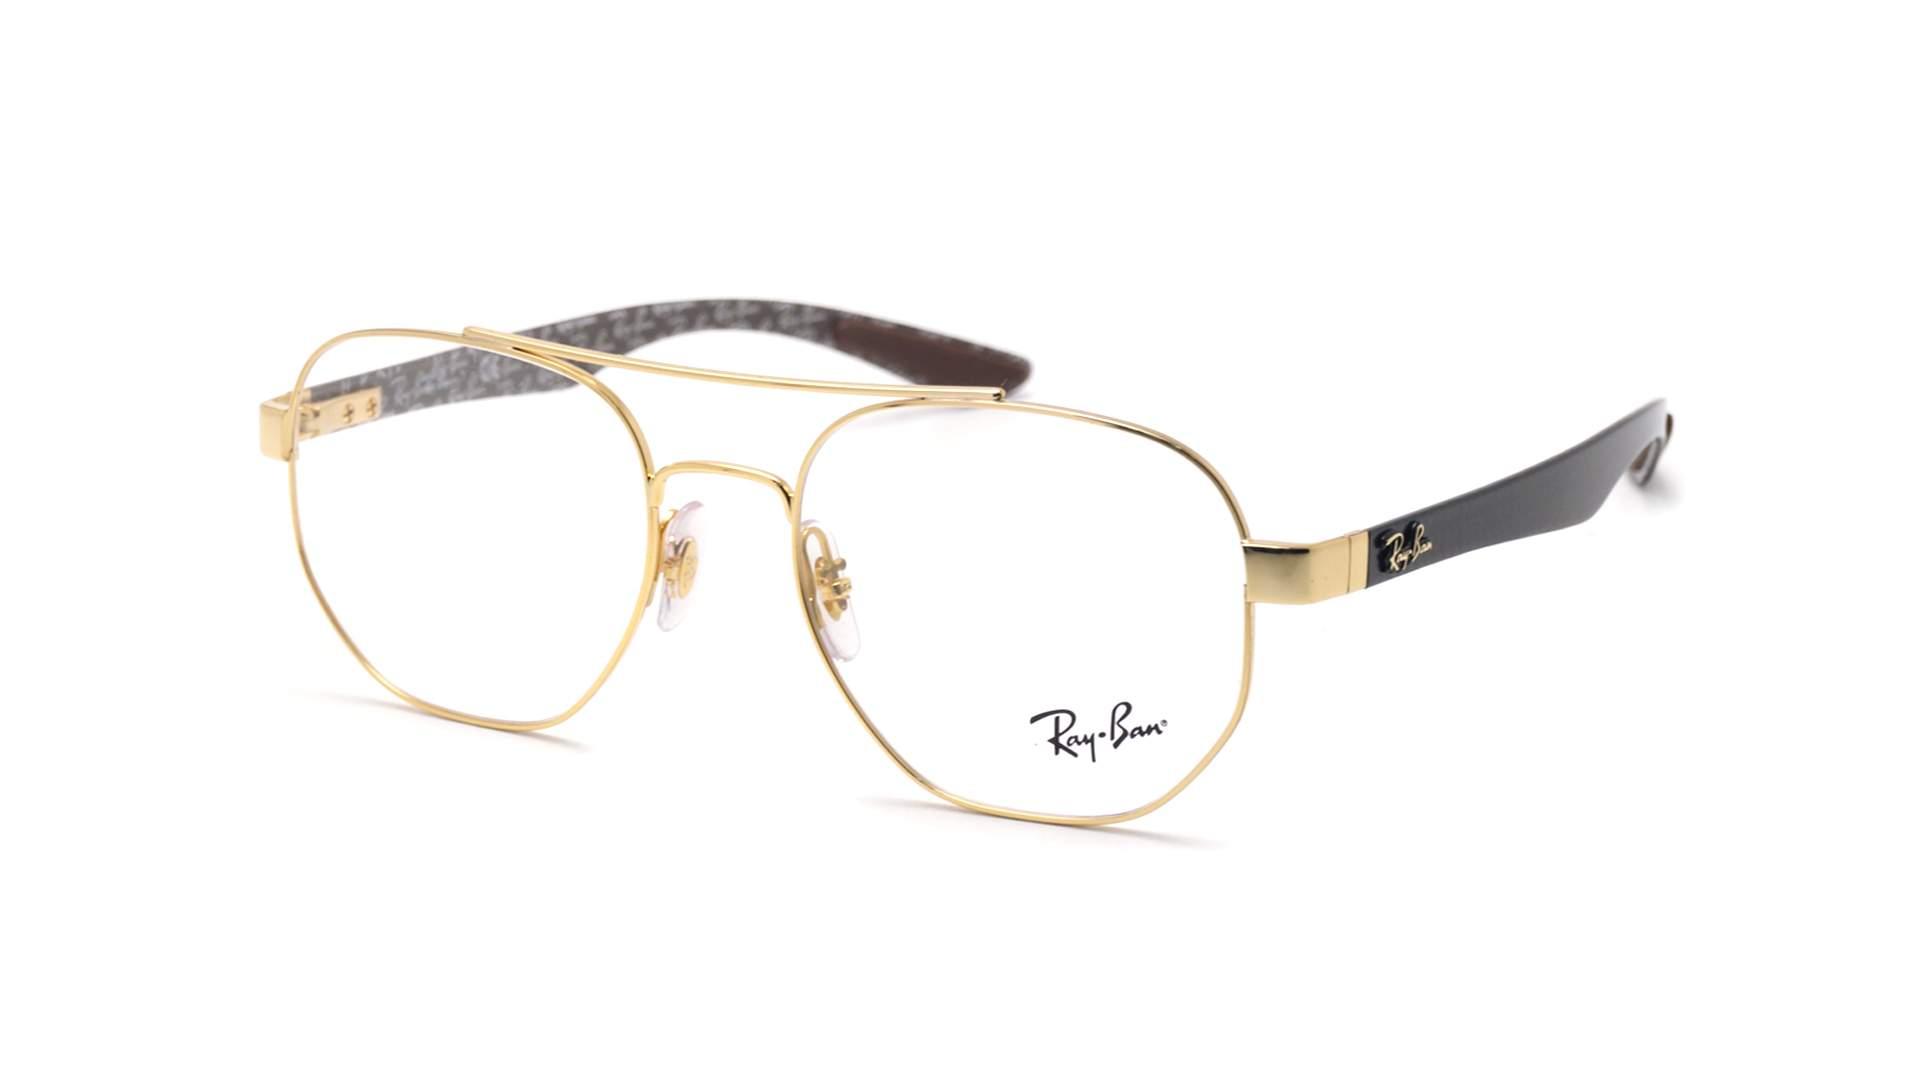 2beb9bedd9 Eyeglasses Ray-Ban Carbon fibre Gold RX8418 RB8418 2500 51-18 Medium